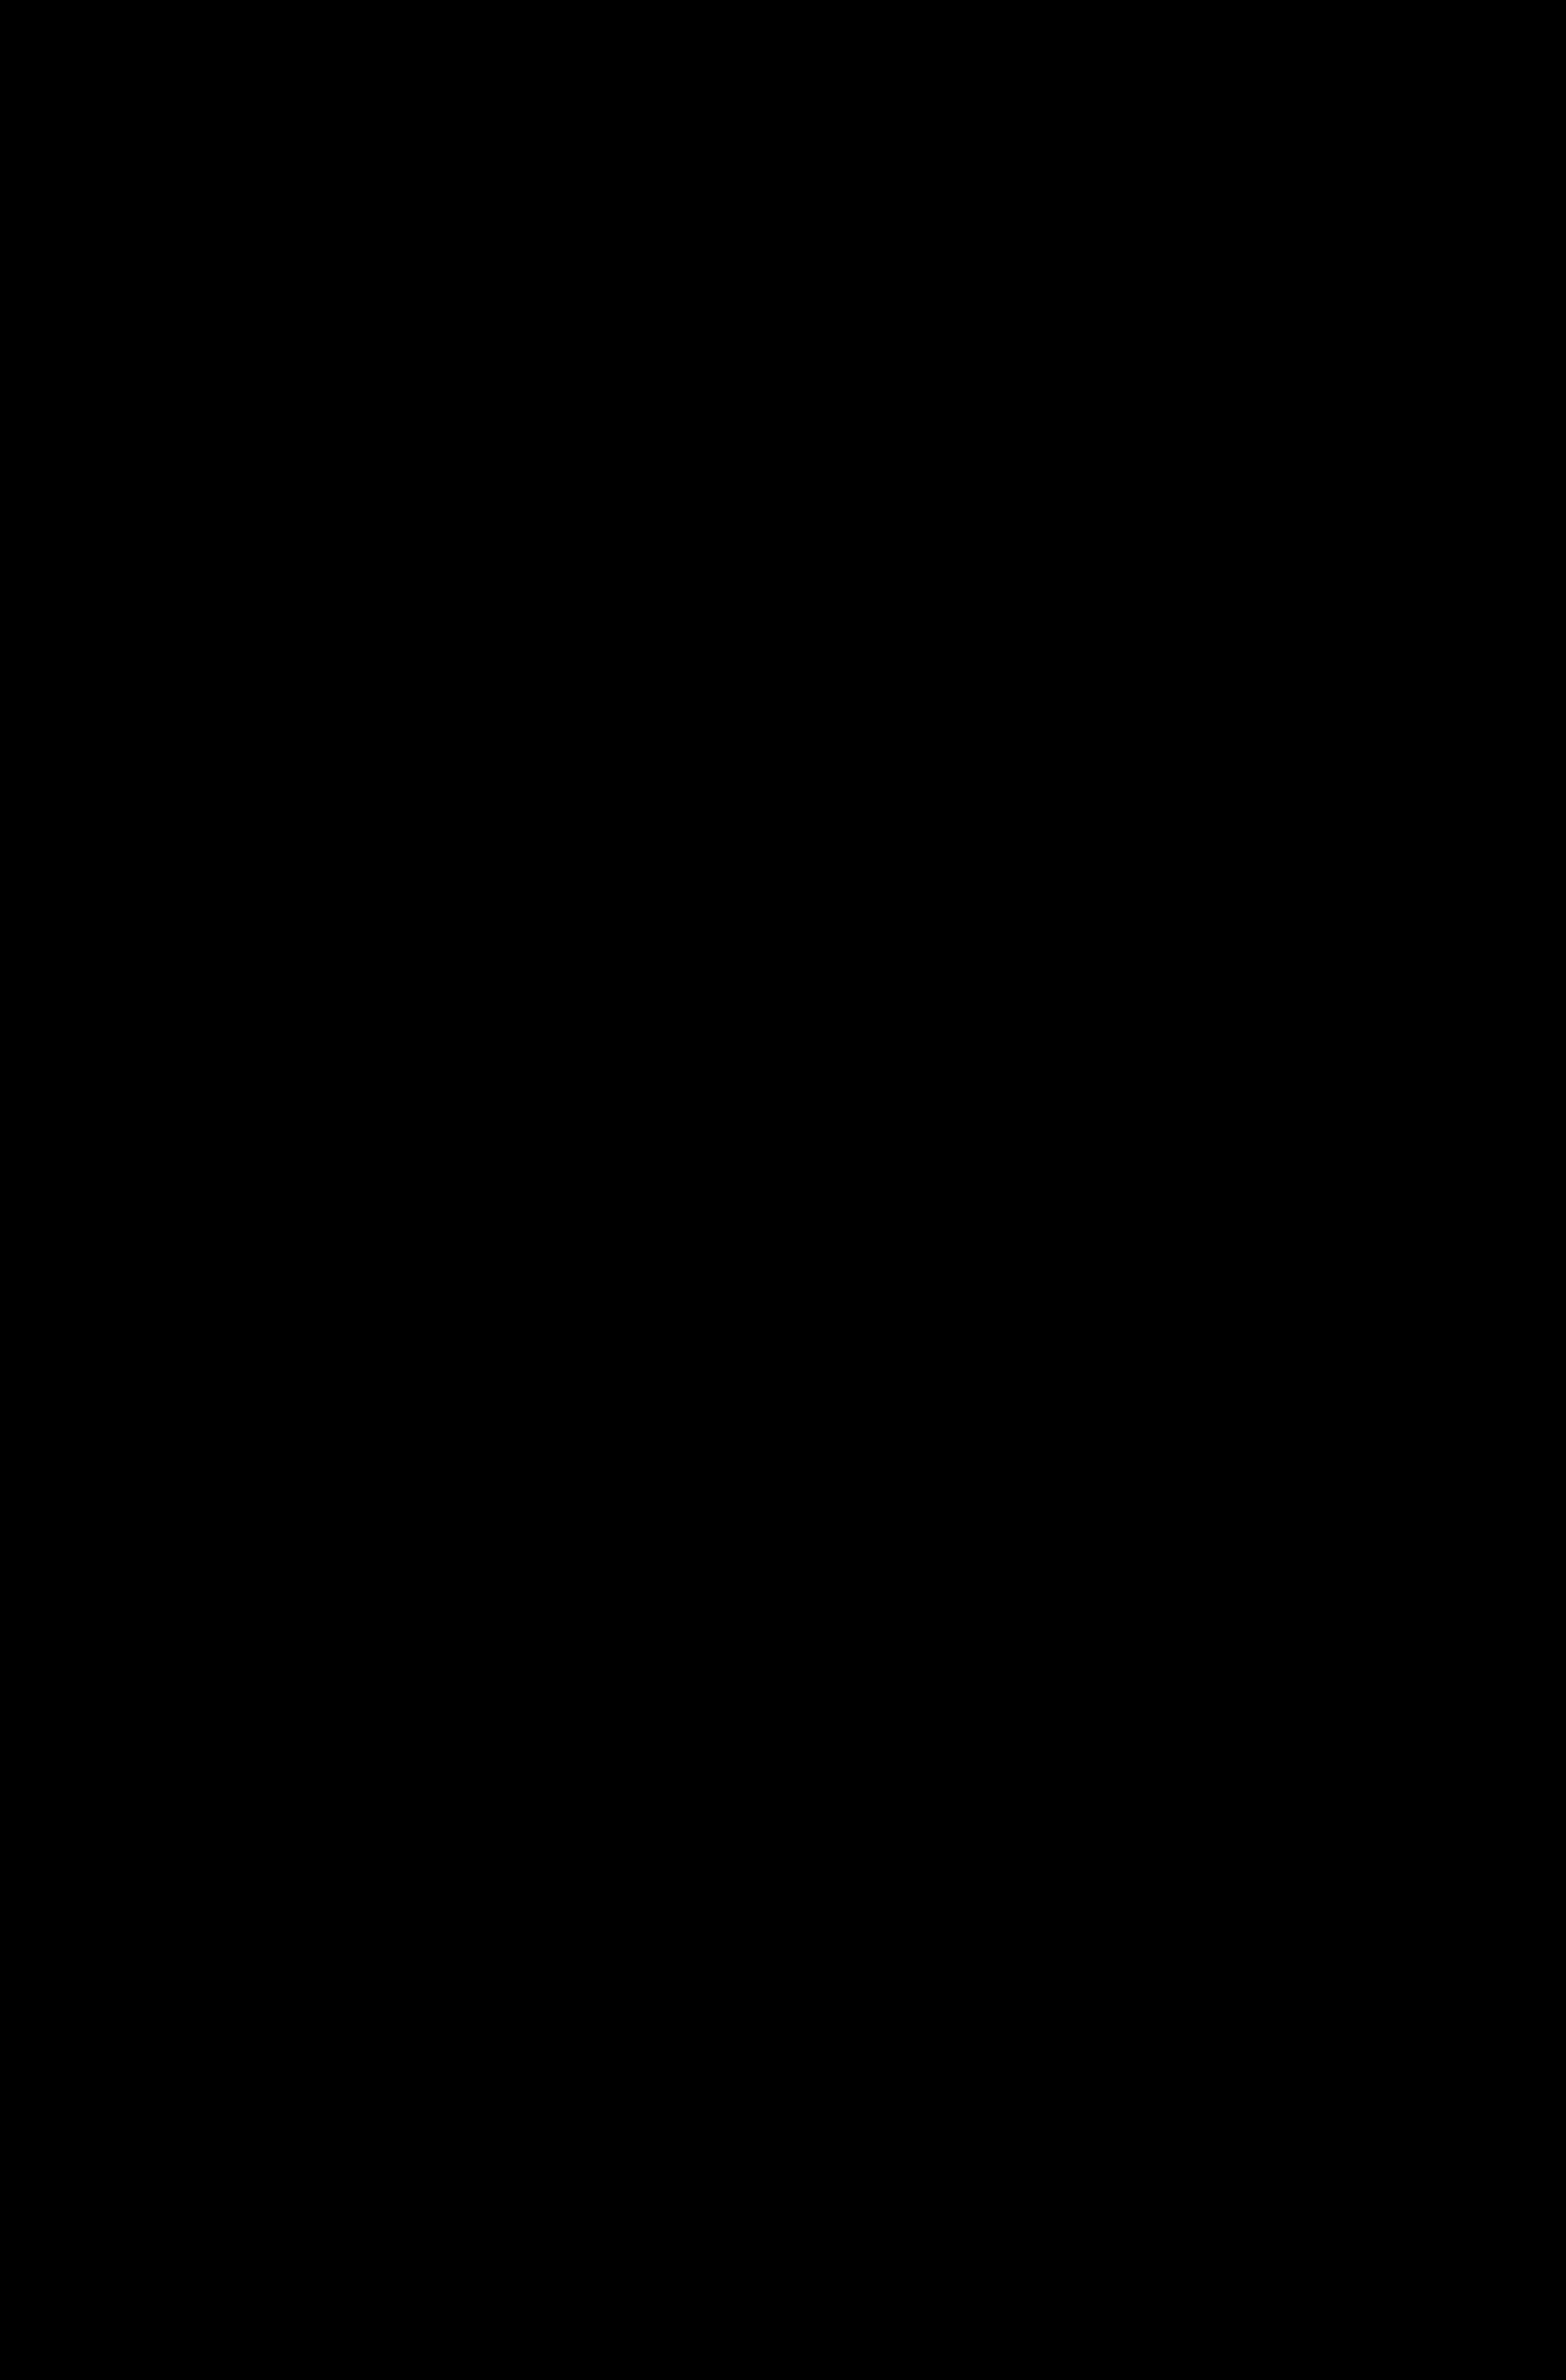 Japan clipart svg. File japanese map symbol